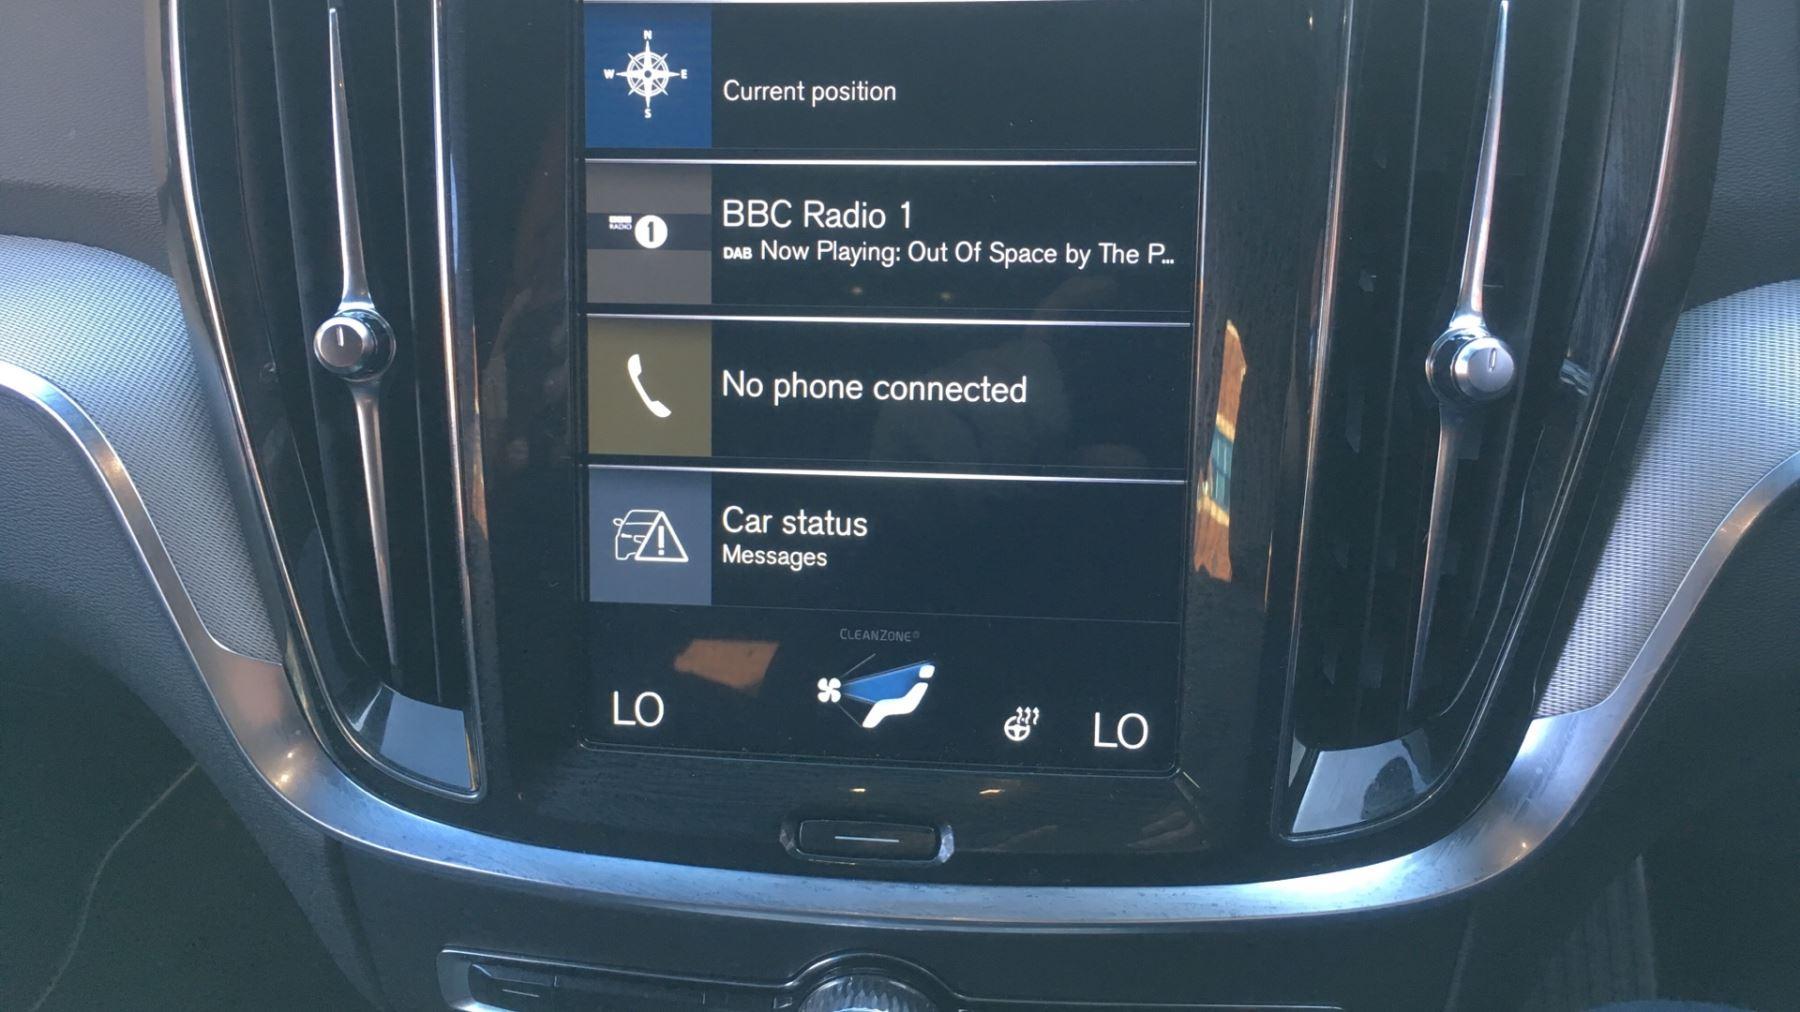 Volvo V60 2.0 D4 [190] R DESIGN 5dr - Volvo on Call, DAB Radio, SAT NAV, Park Assist image 21